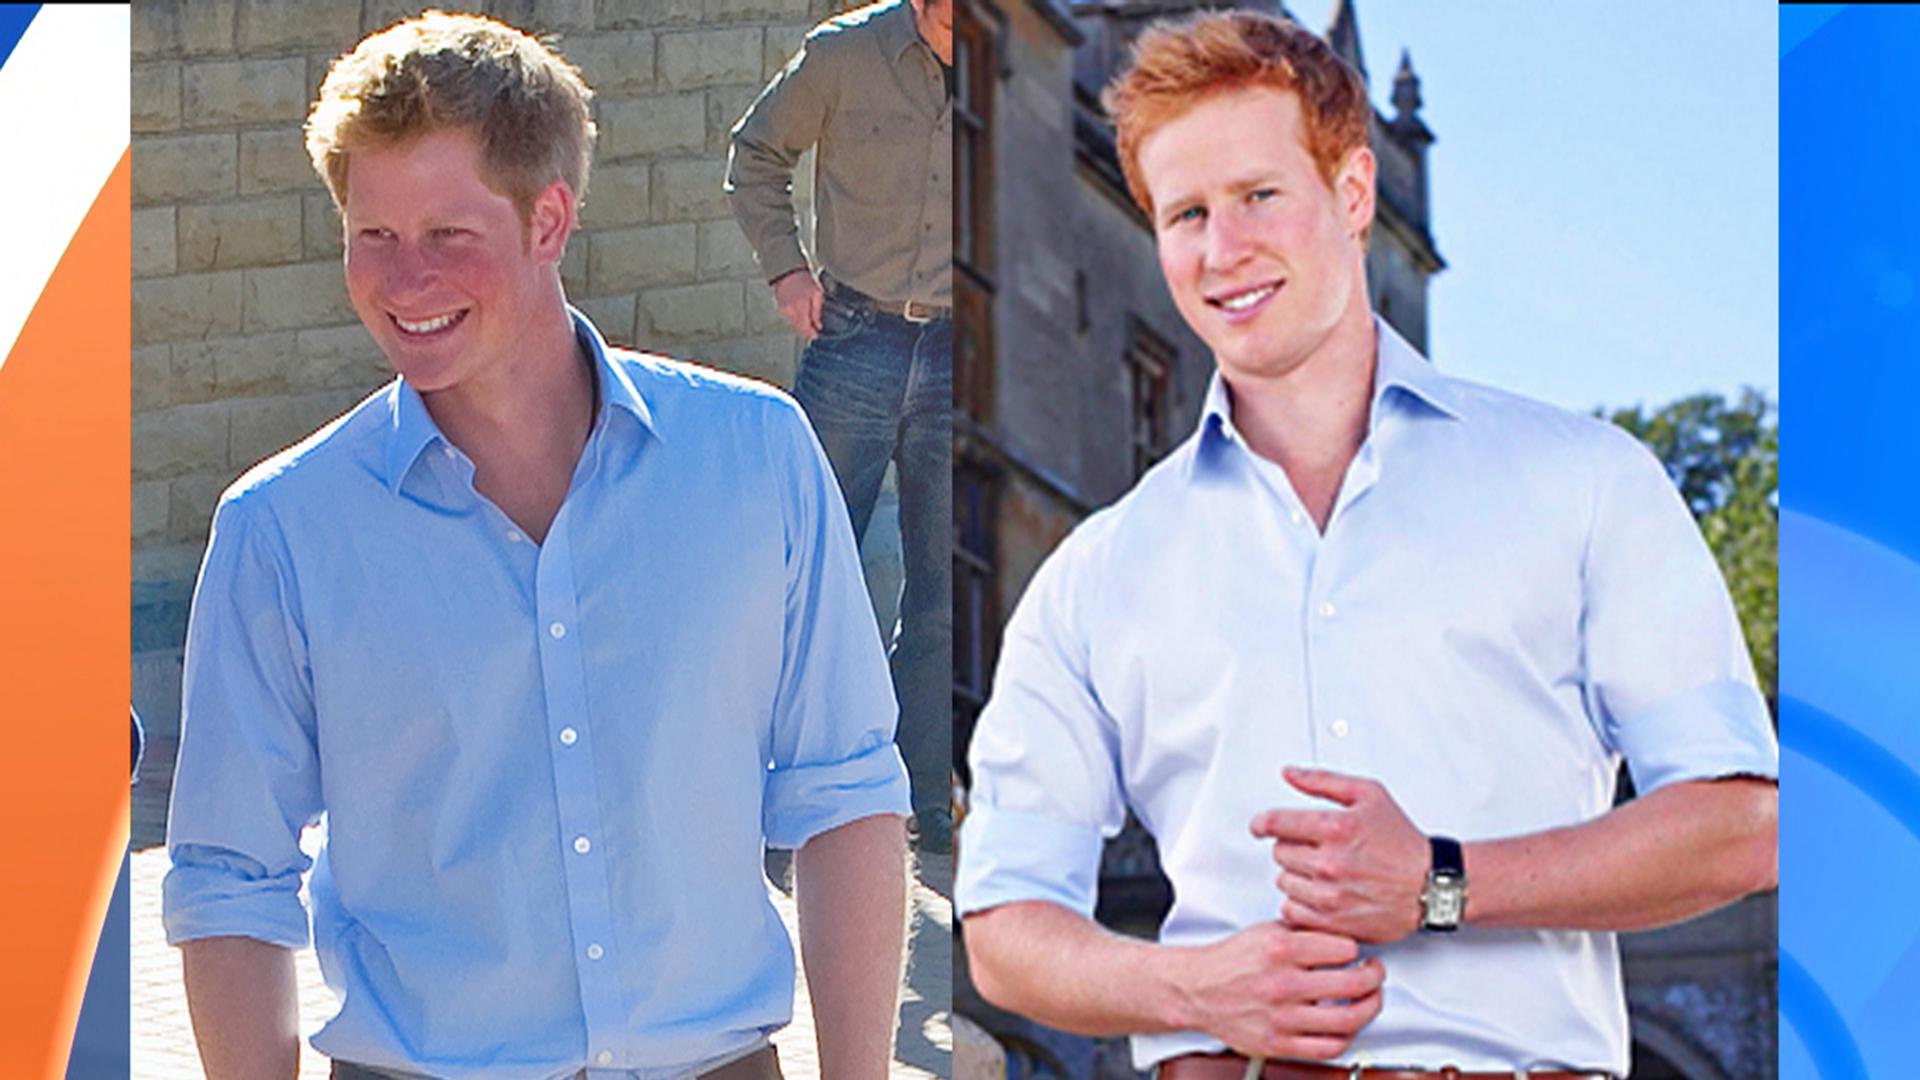 Right: Prince Harry. Left: Matt Hicks, Prince Harry-lookalike